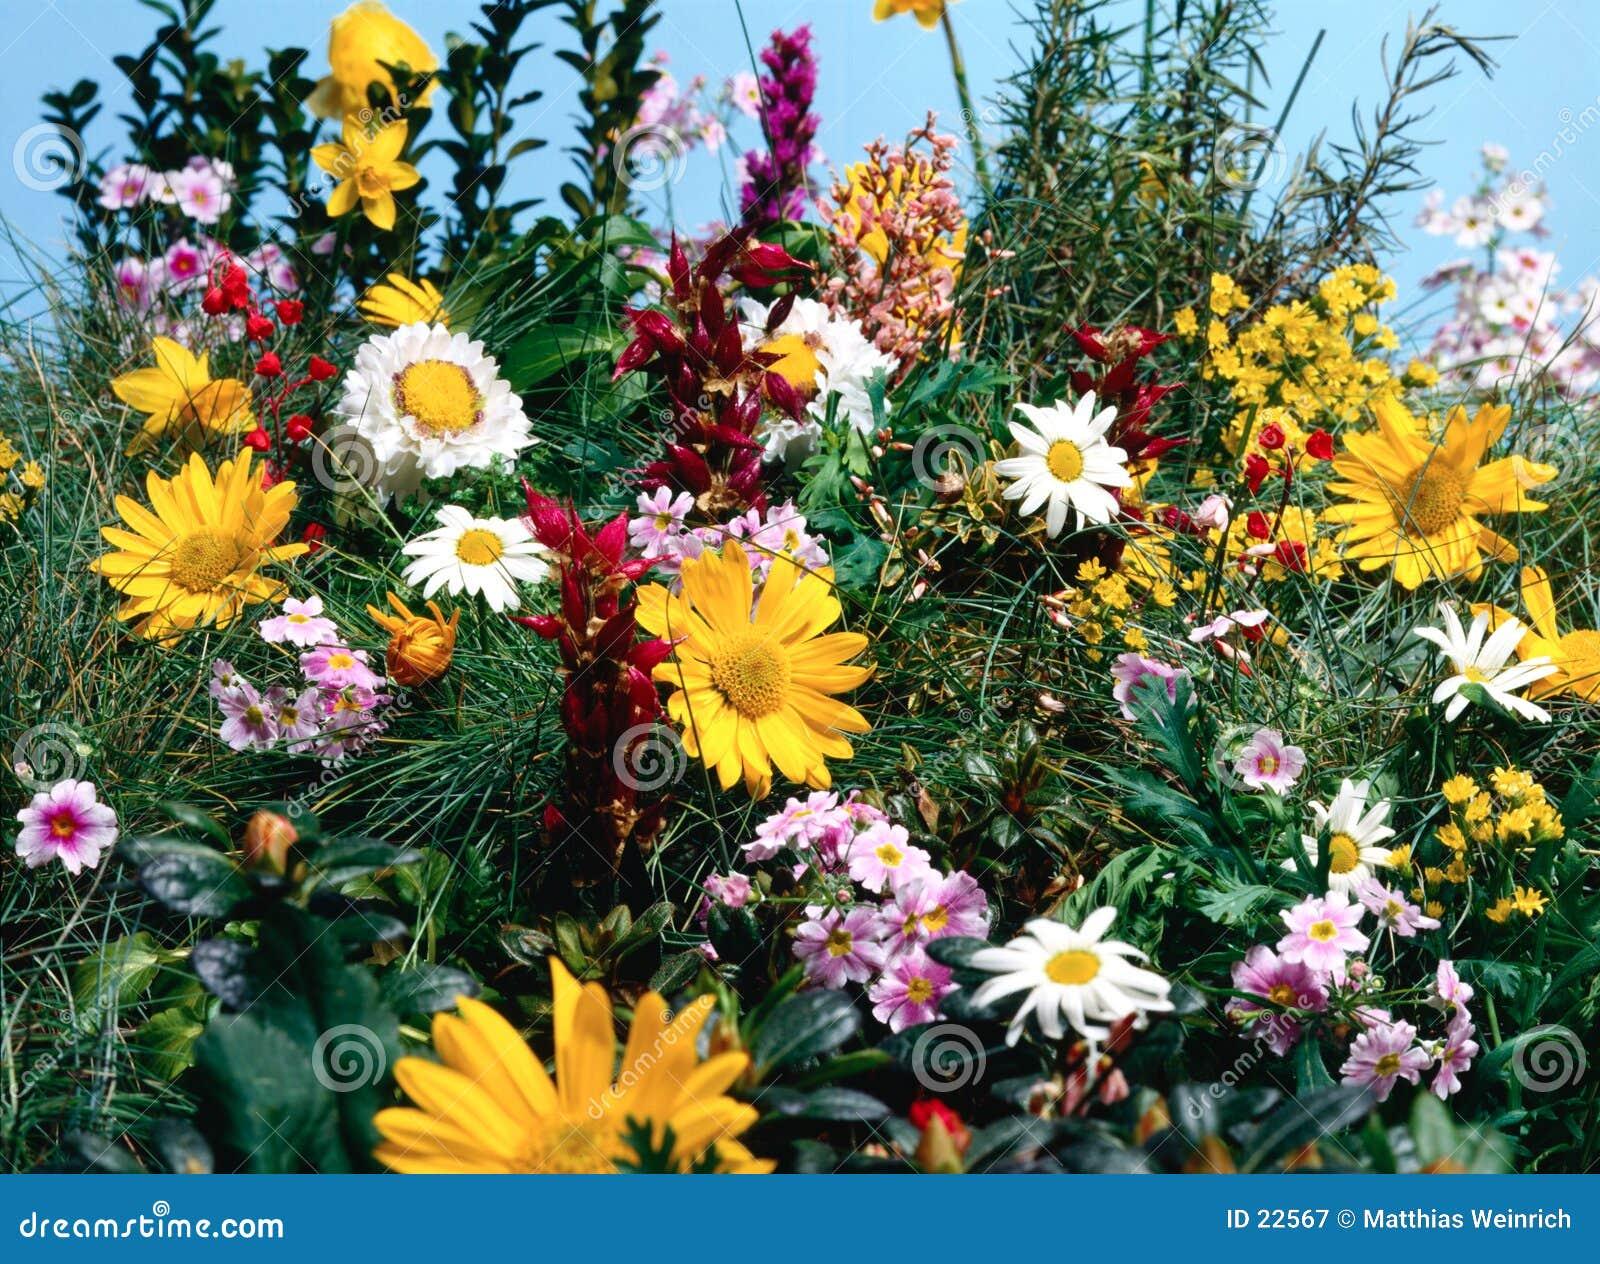 Meadow full of flowers